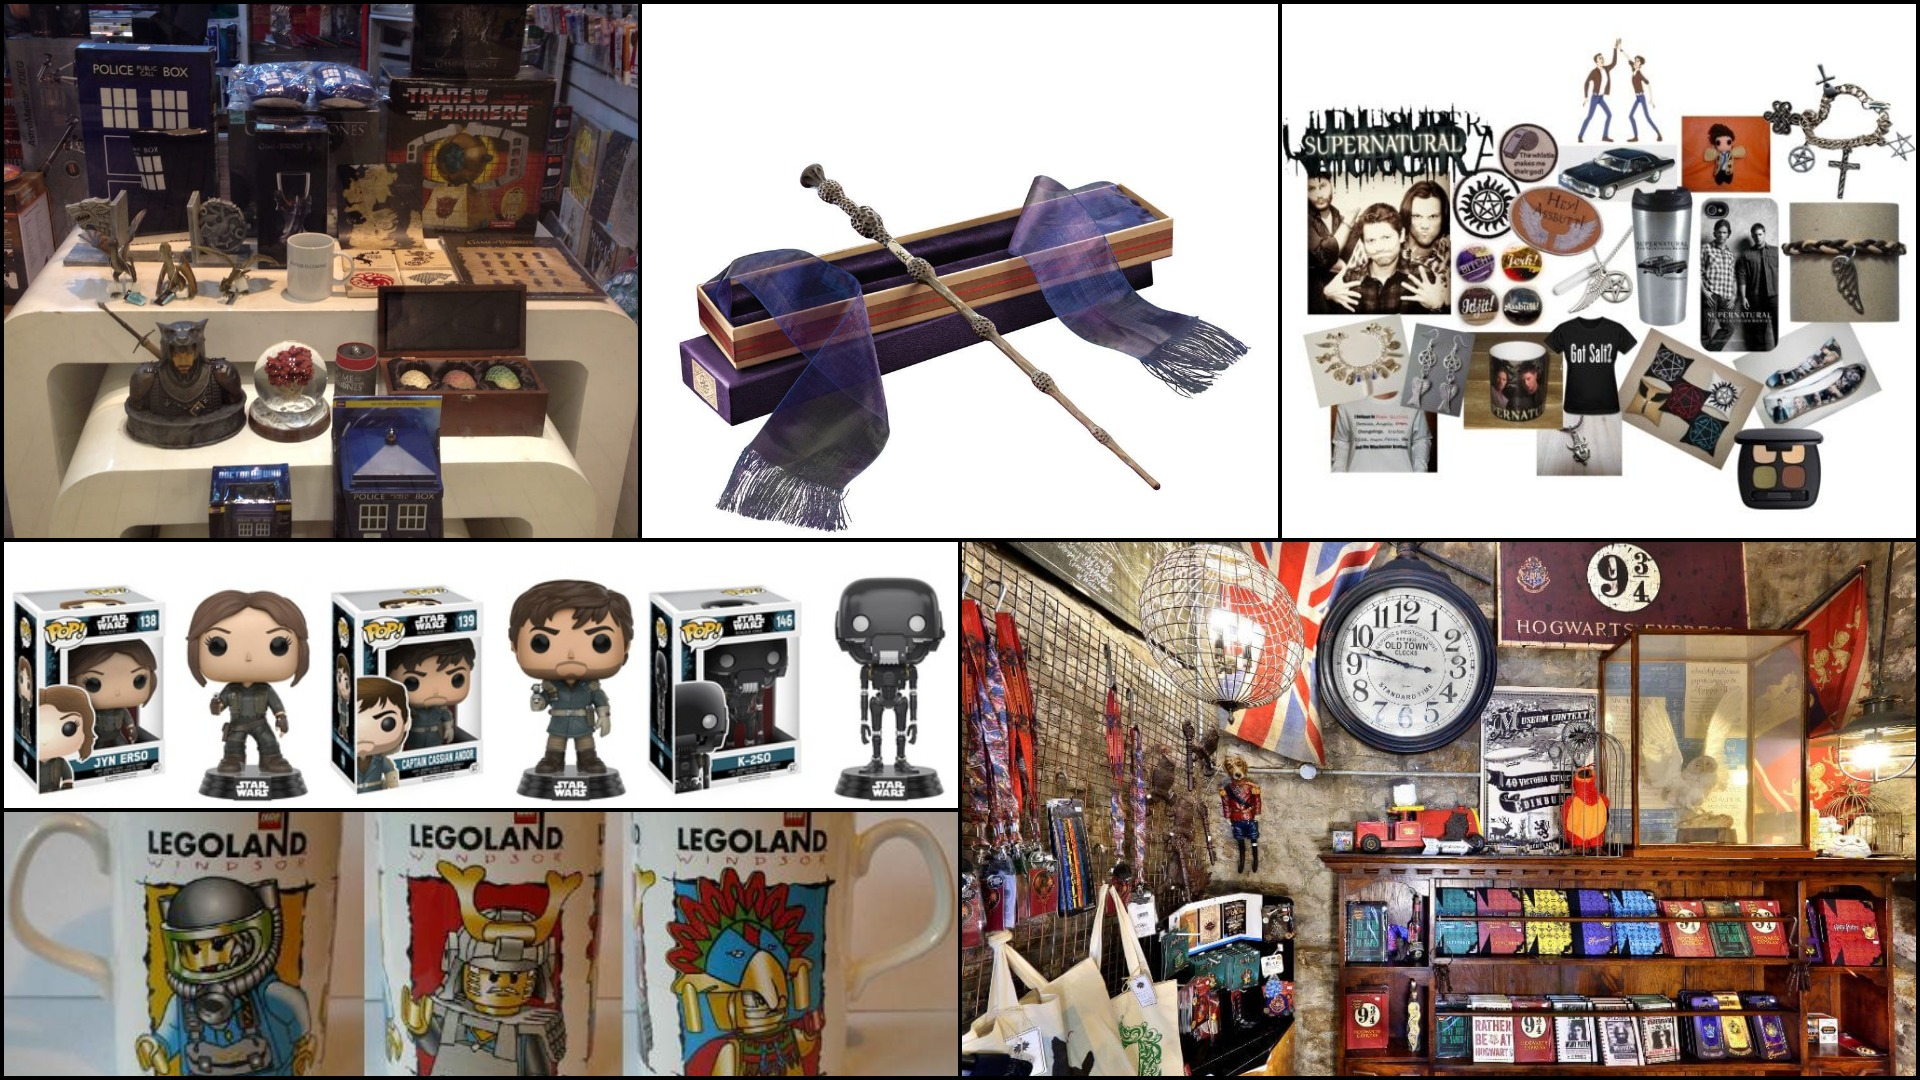 Fandom merchandise - gifts